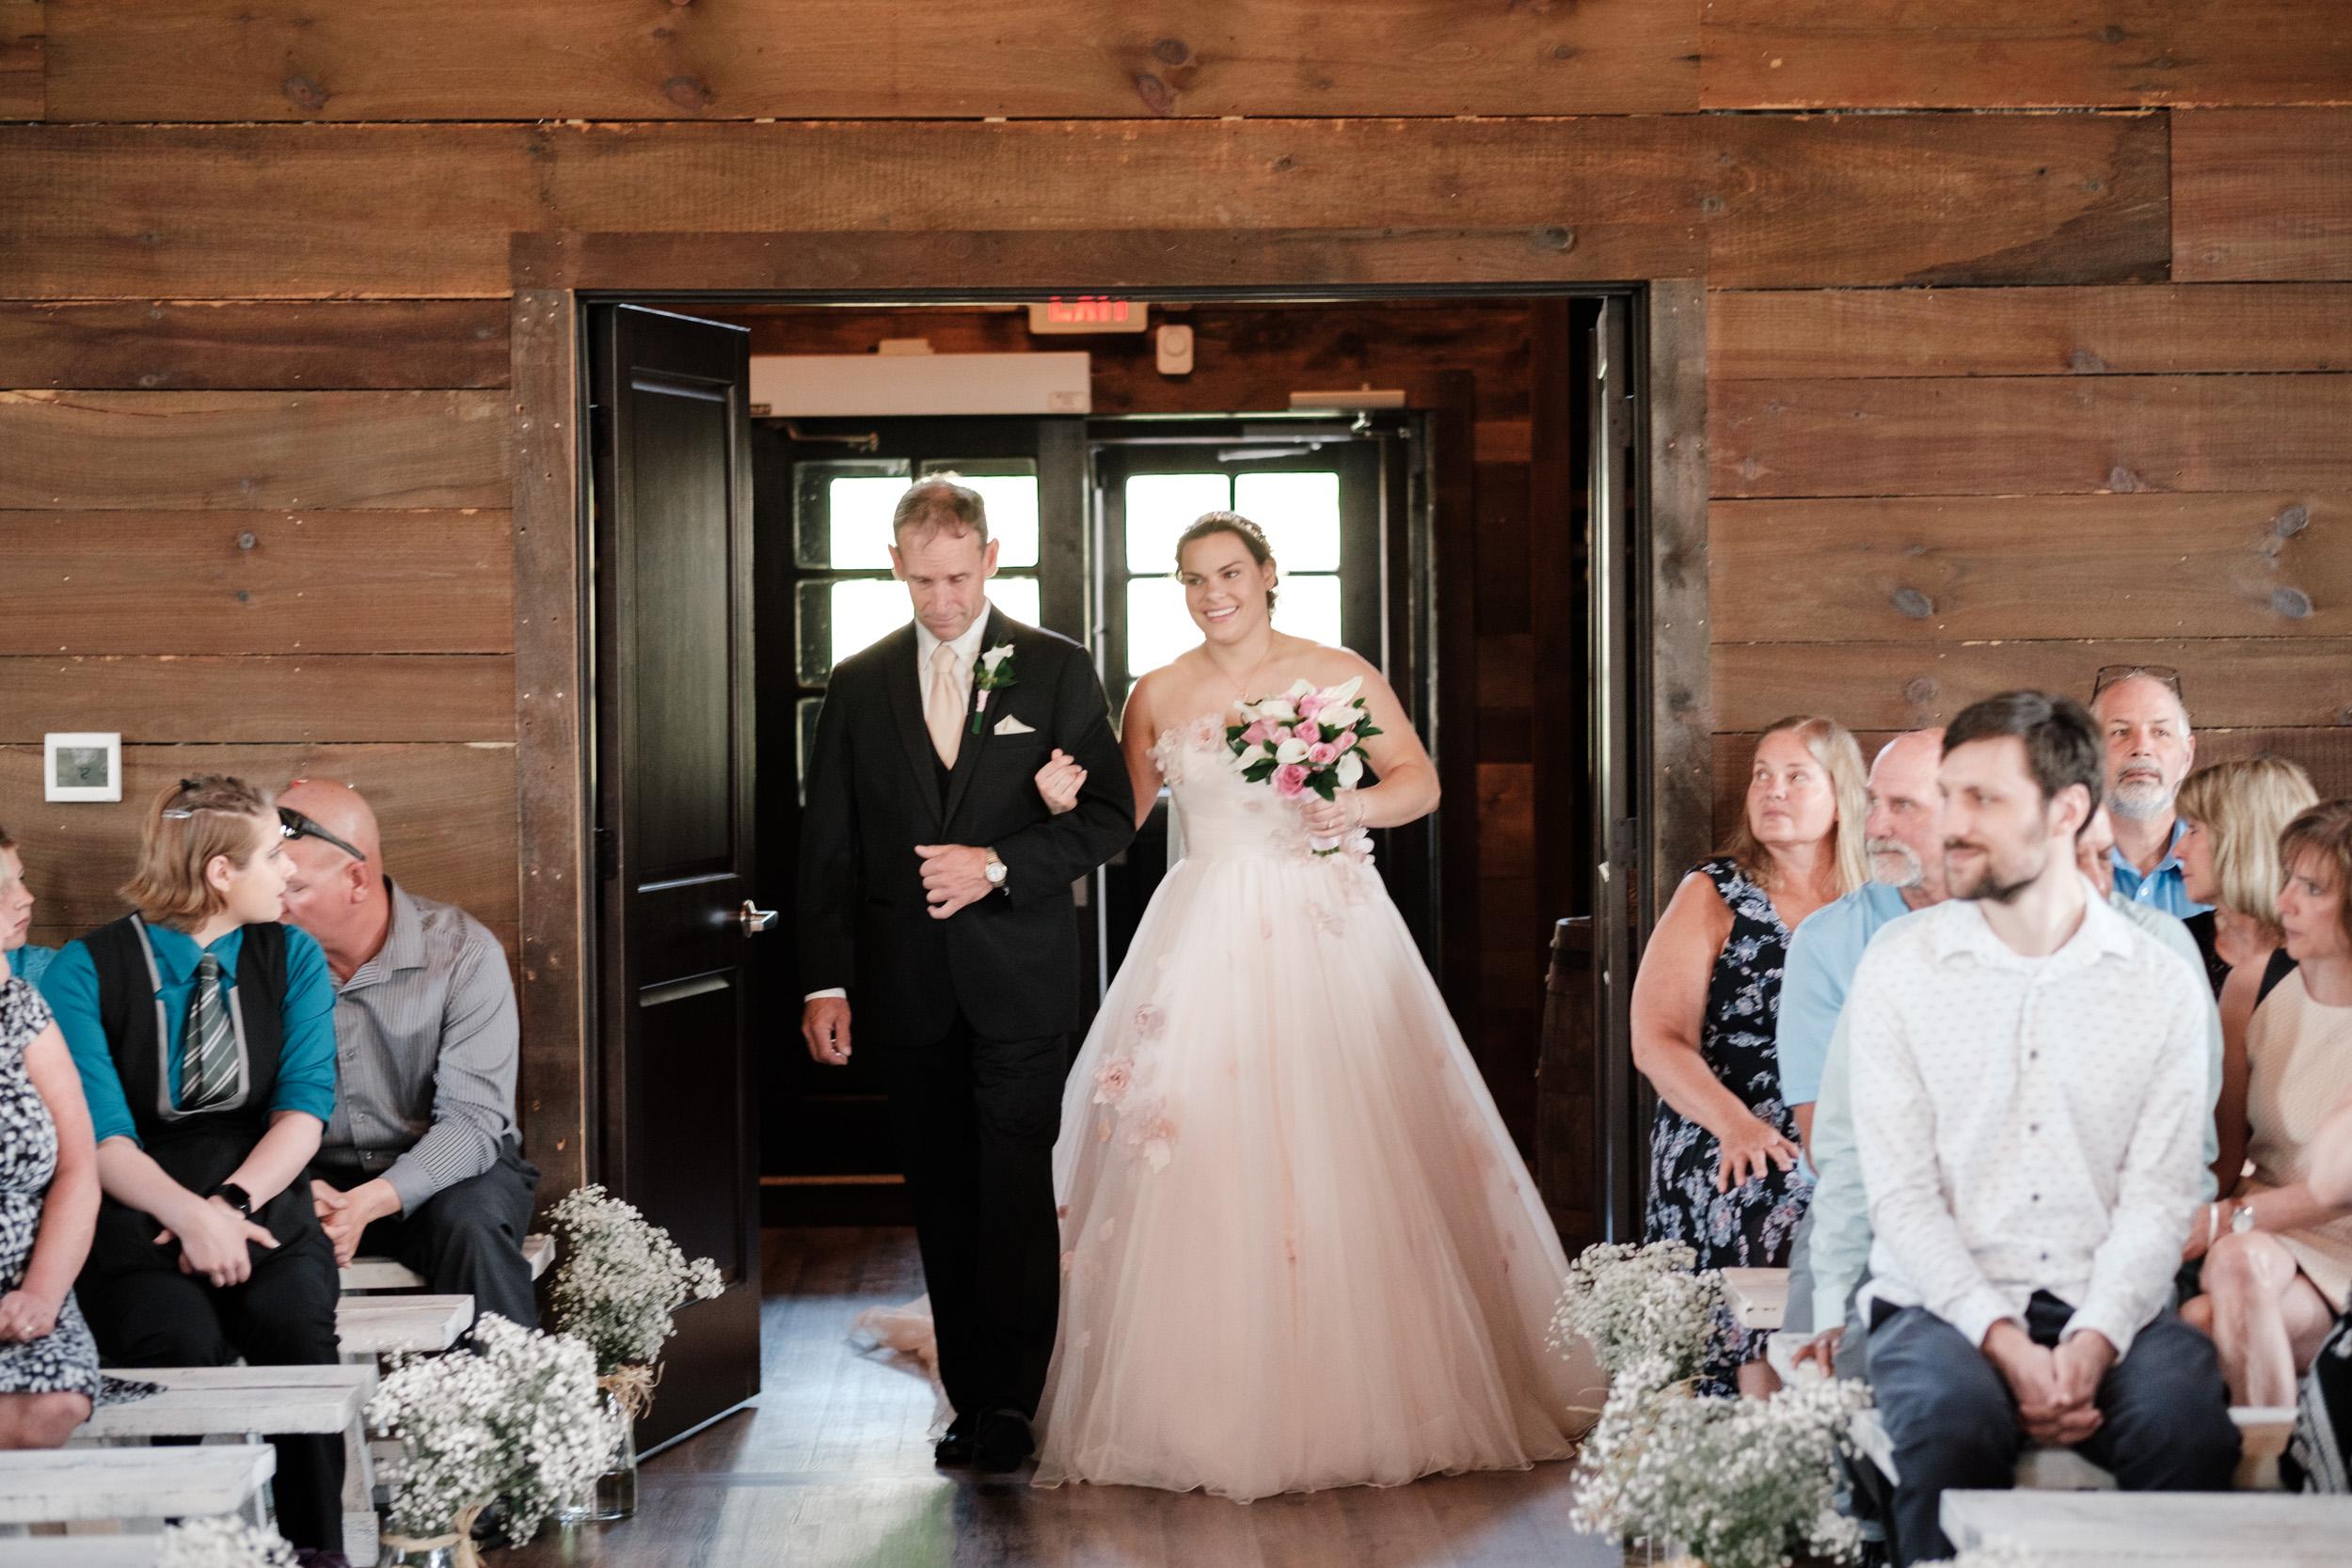 19-06-22-Ryan-Katie-The-Fields-Reserve-Wedding-19.jpg